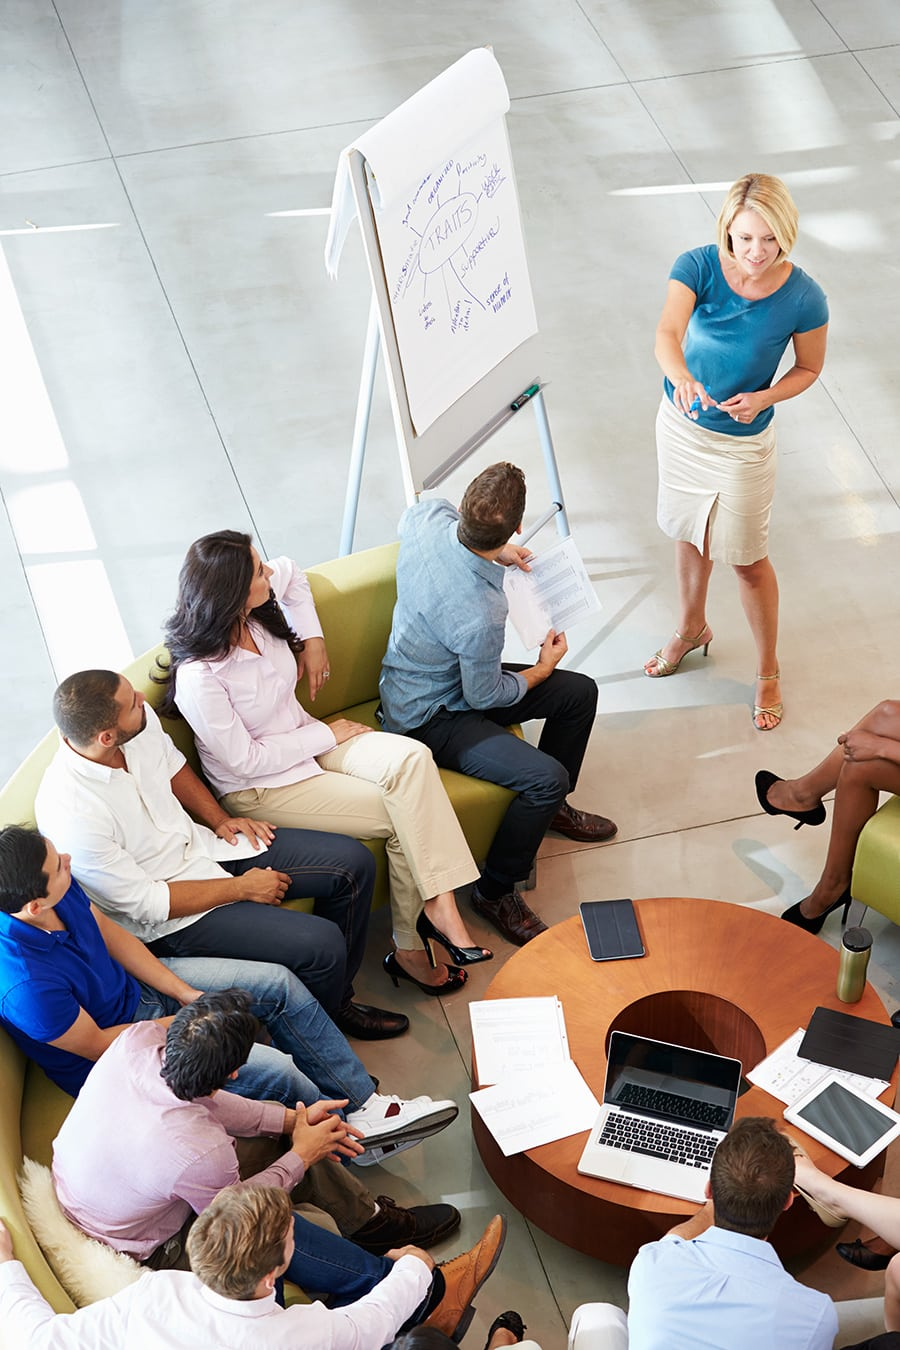 Female entrepreneur making business presentations to prospective investors